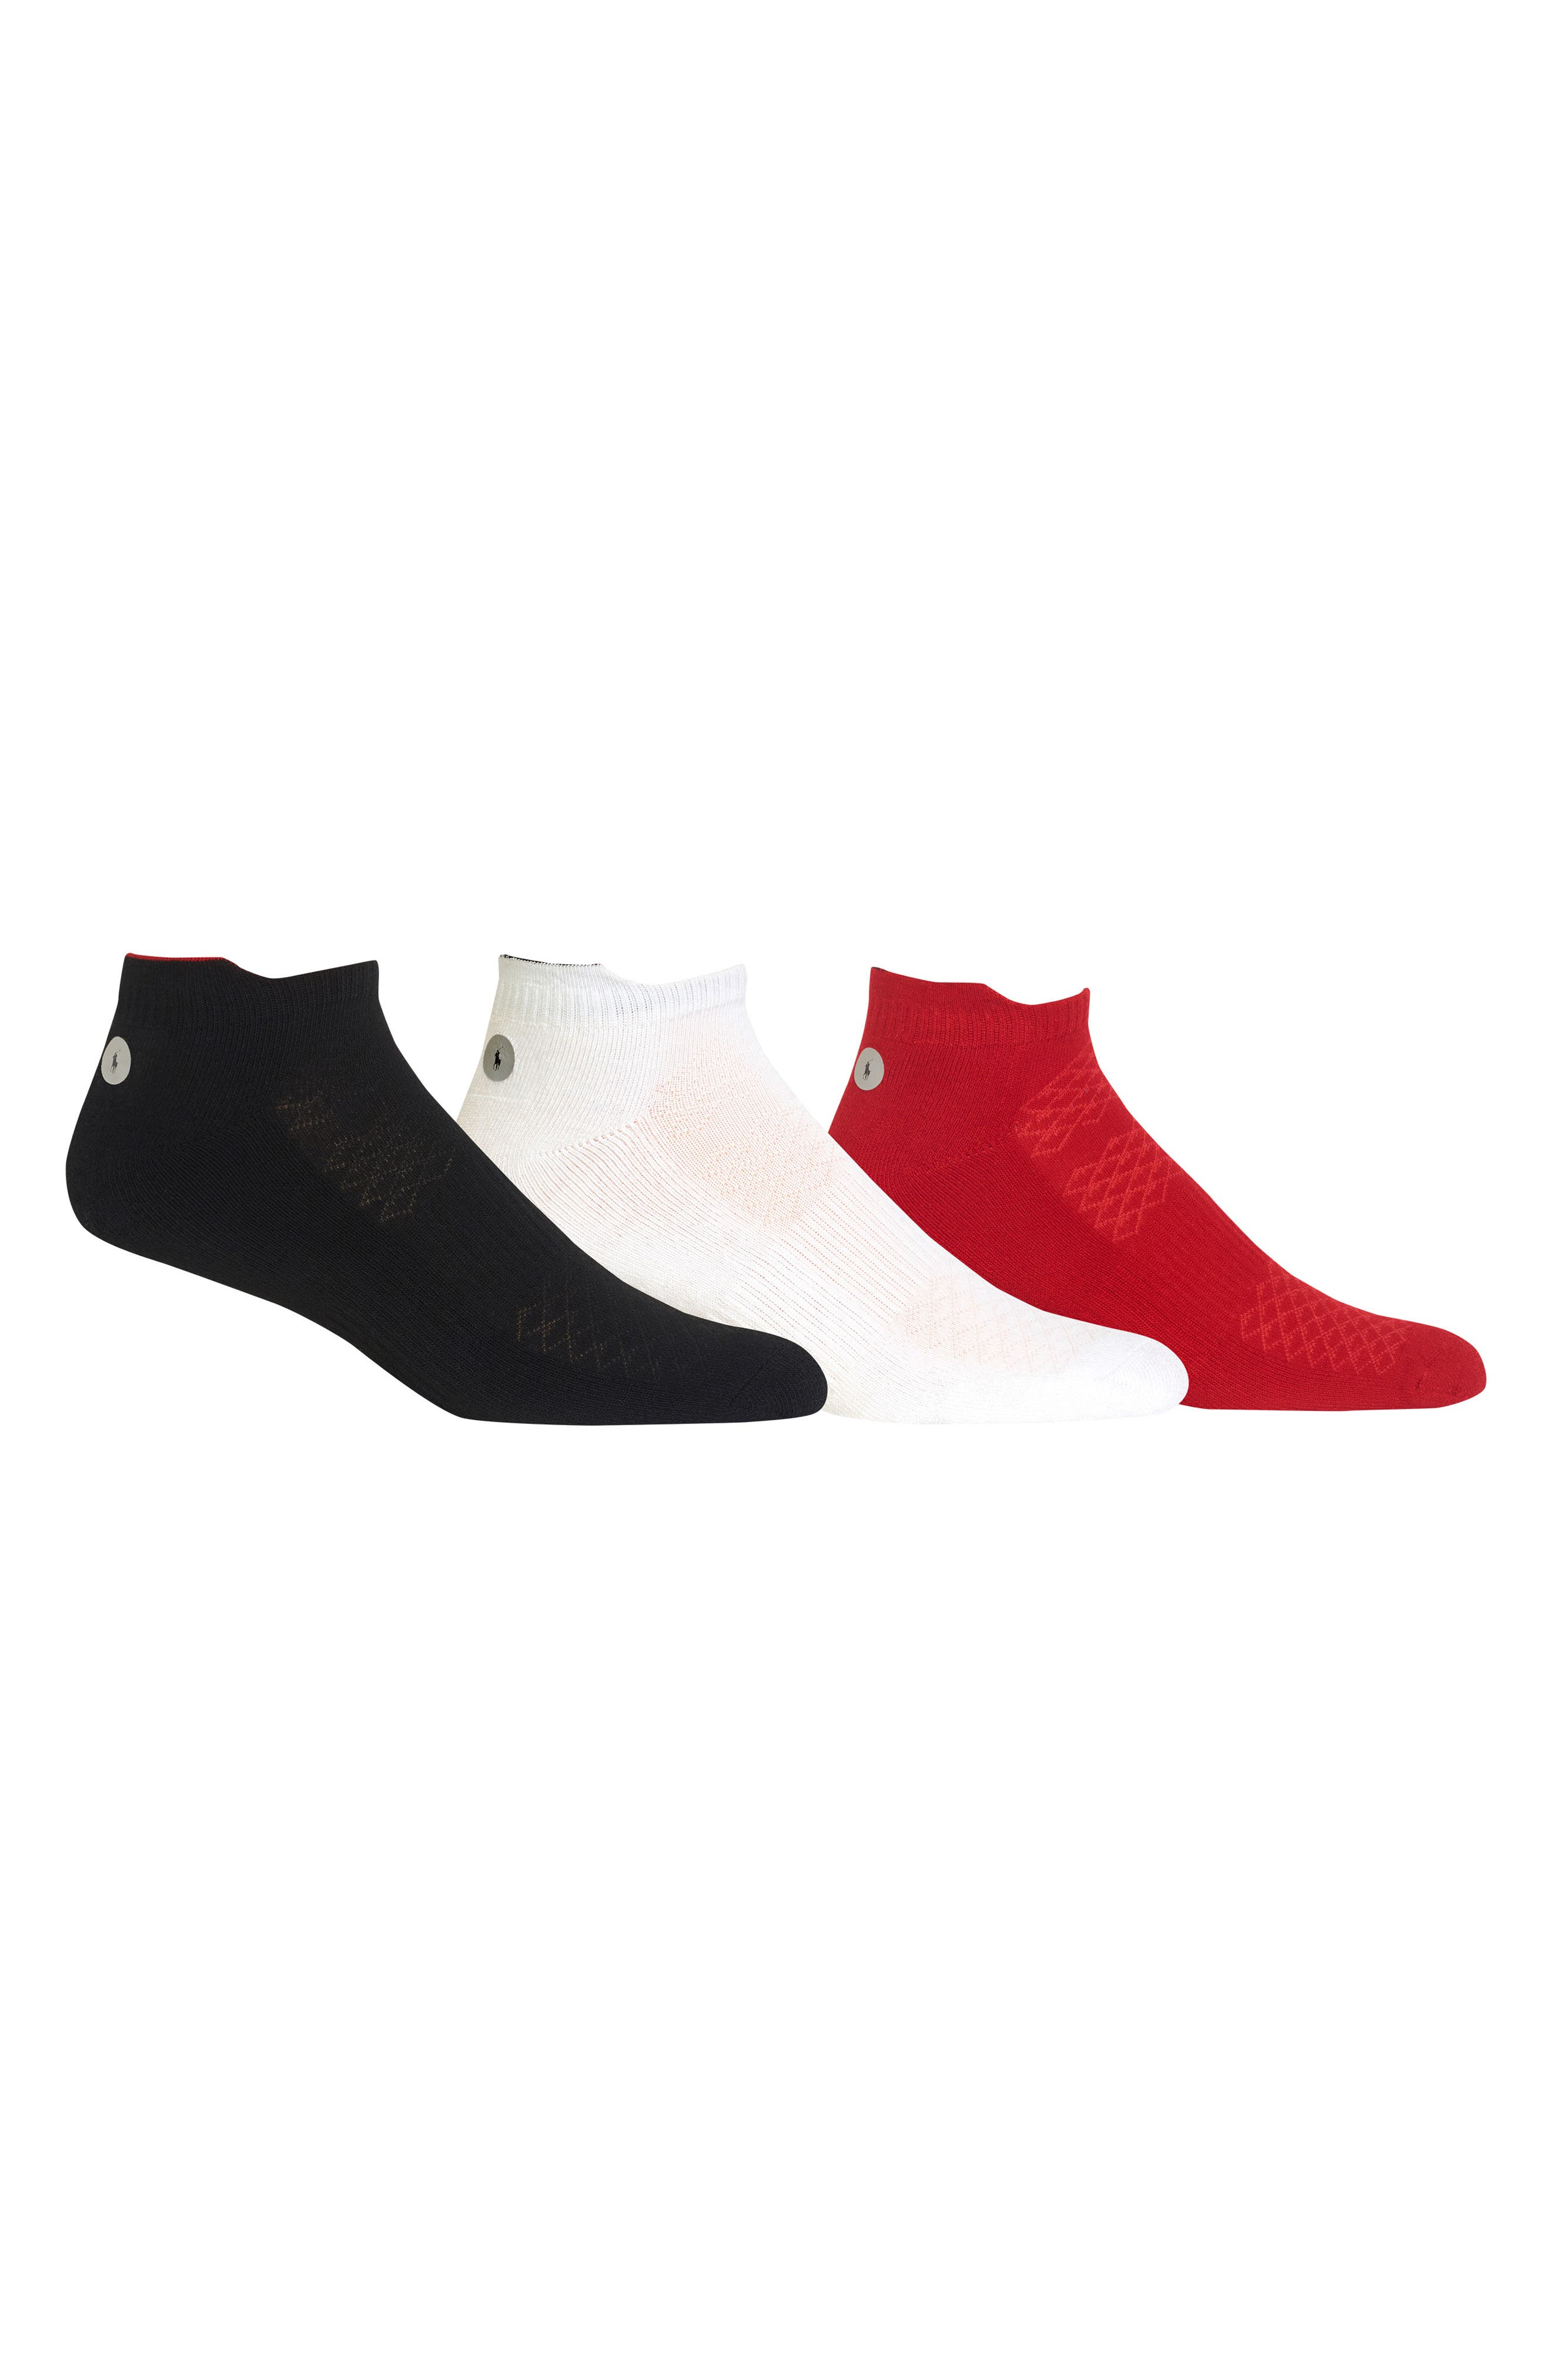 3-Pack Reflector Ankle Socks, Main, color, BLACK MULTI